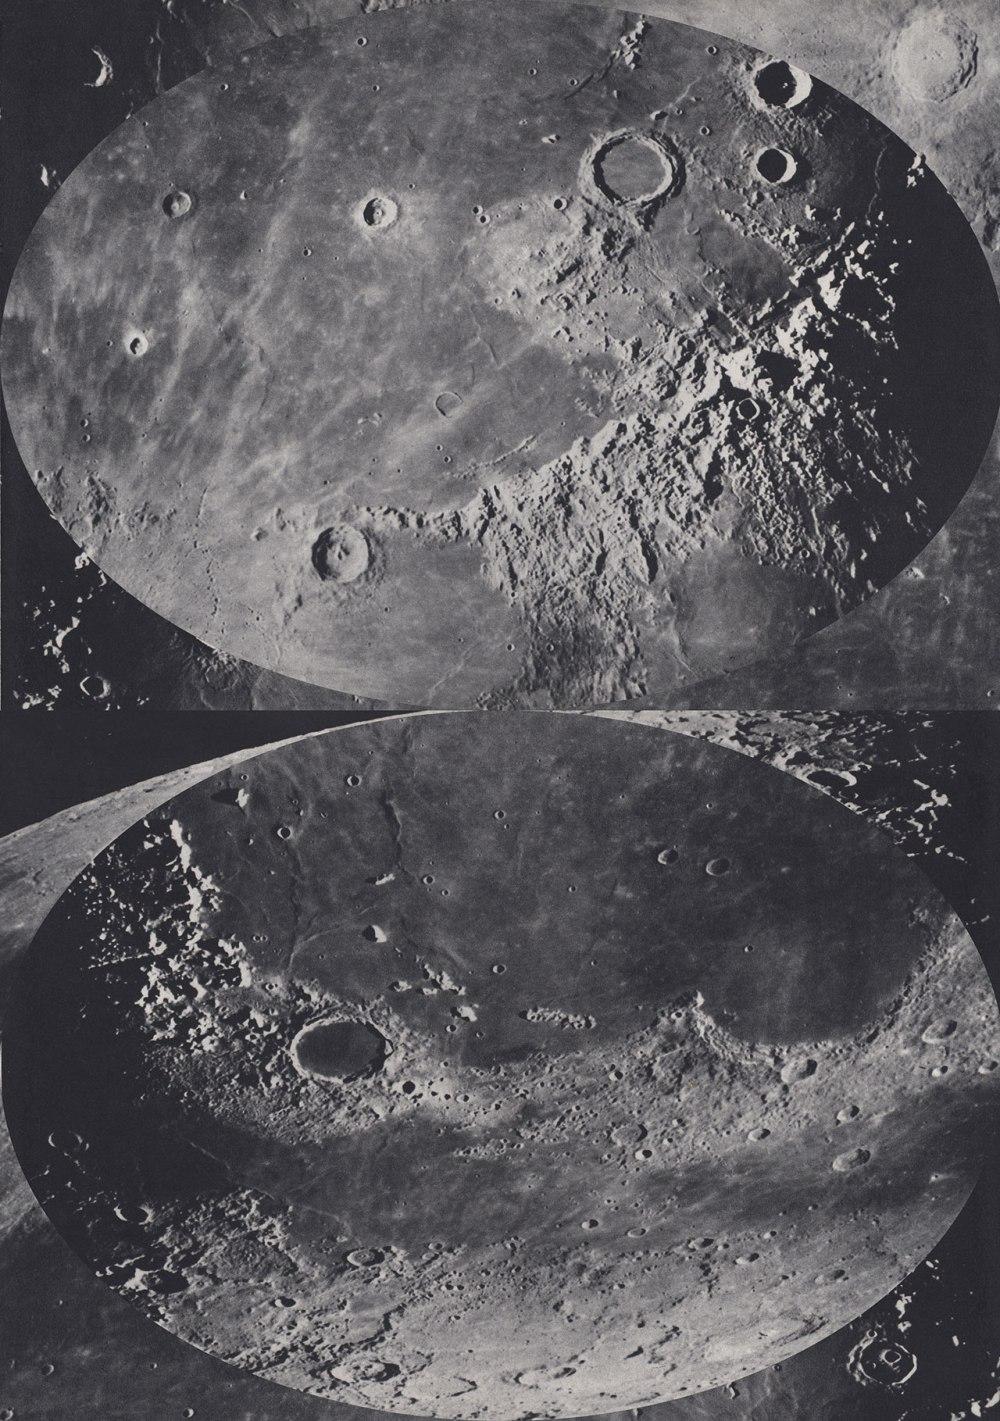 f13_luis_dourado_moons_untitled_yatzer